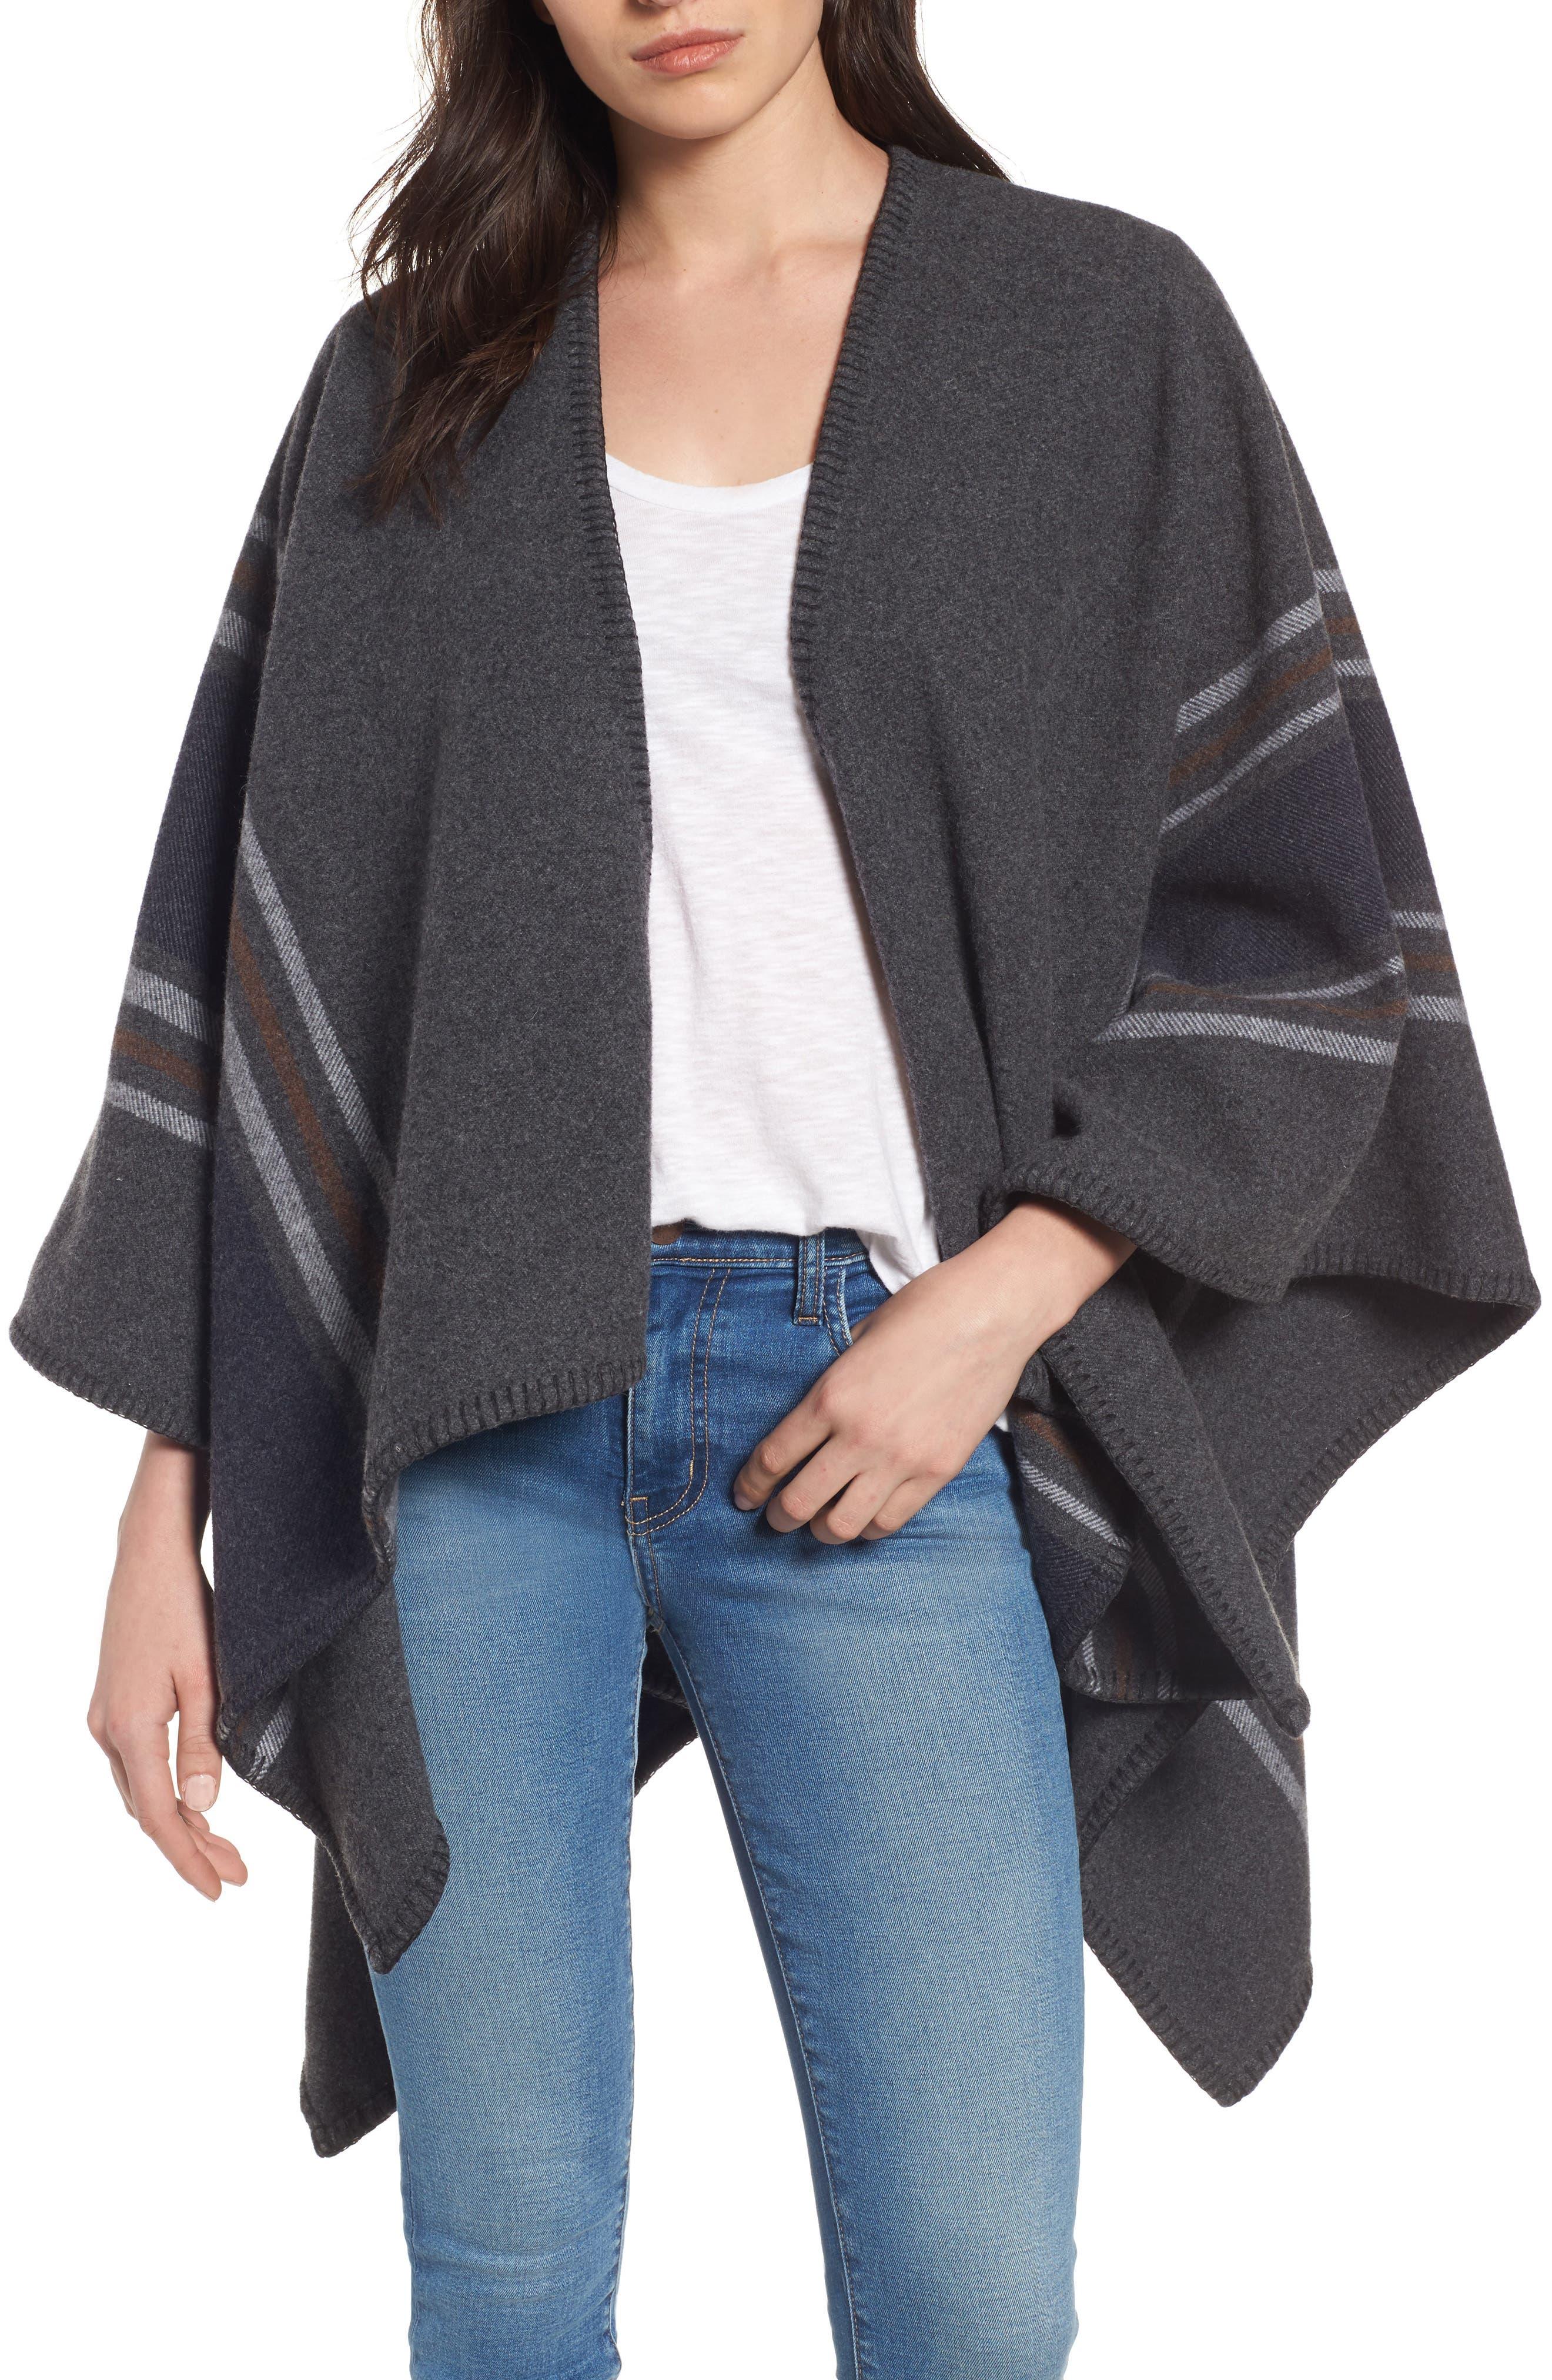 Addison Stripe Wool Wrap,                             Main thumbnail 1, color,                             020